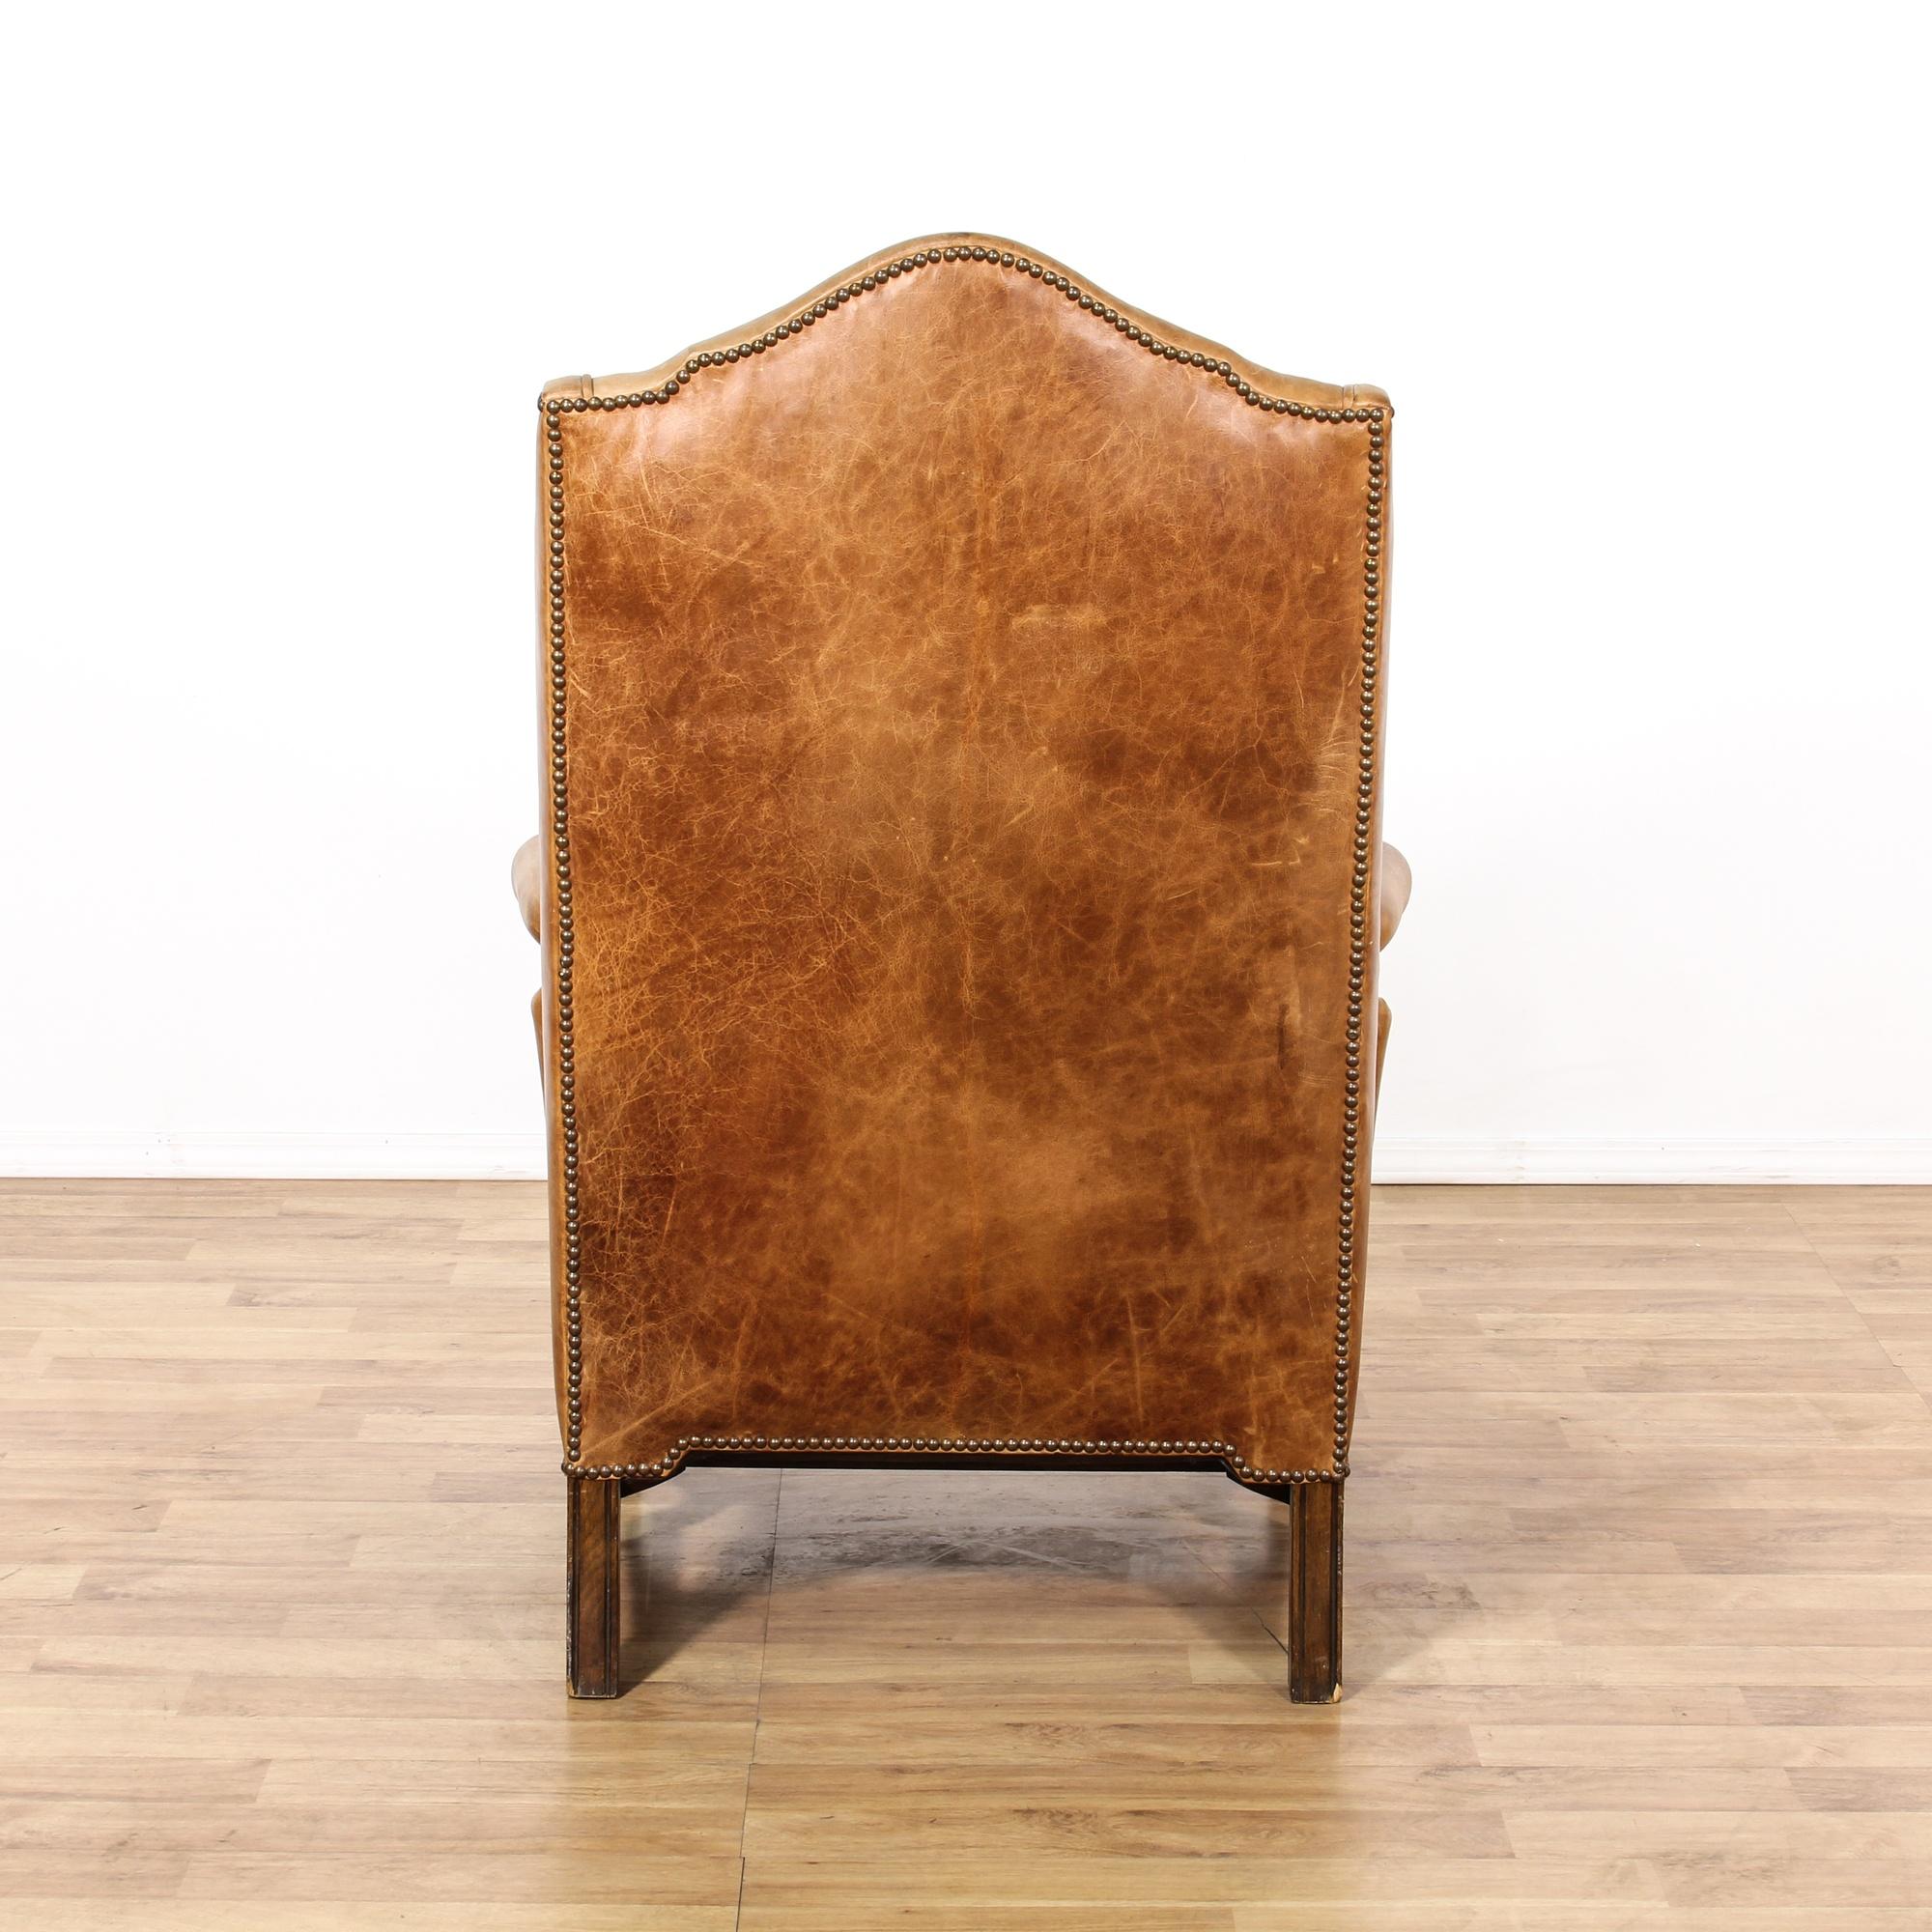 American Furniture Warehouse Desks ... Armchair | Loveseat Vintage Furniture San Diego & Los Angeles